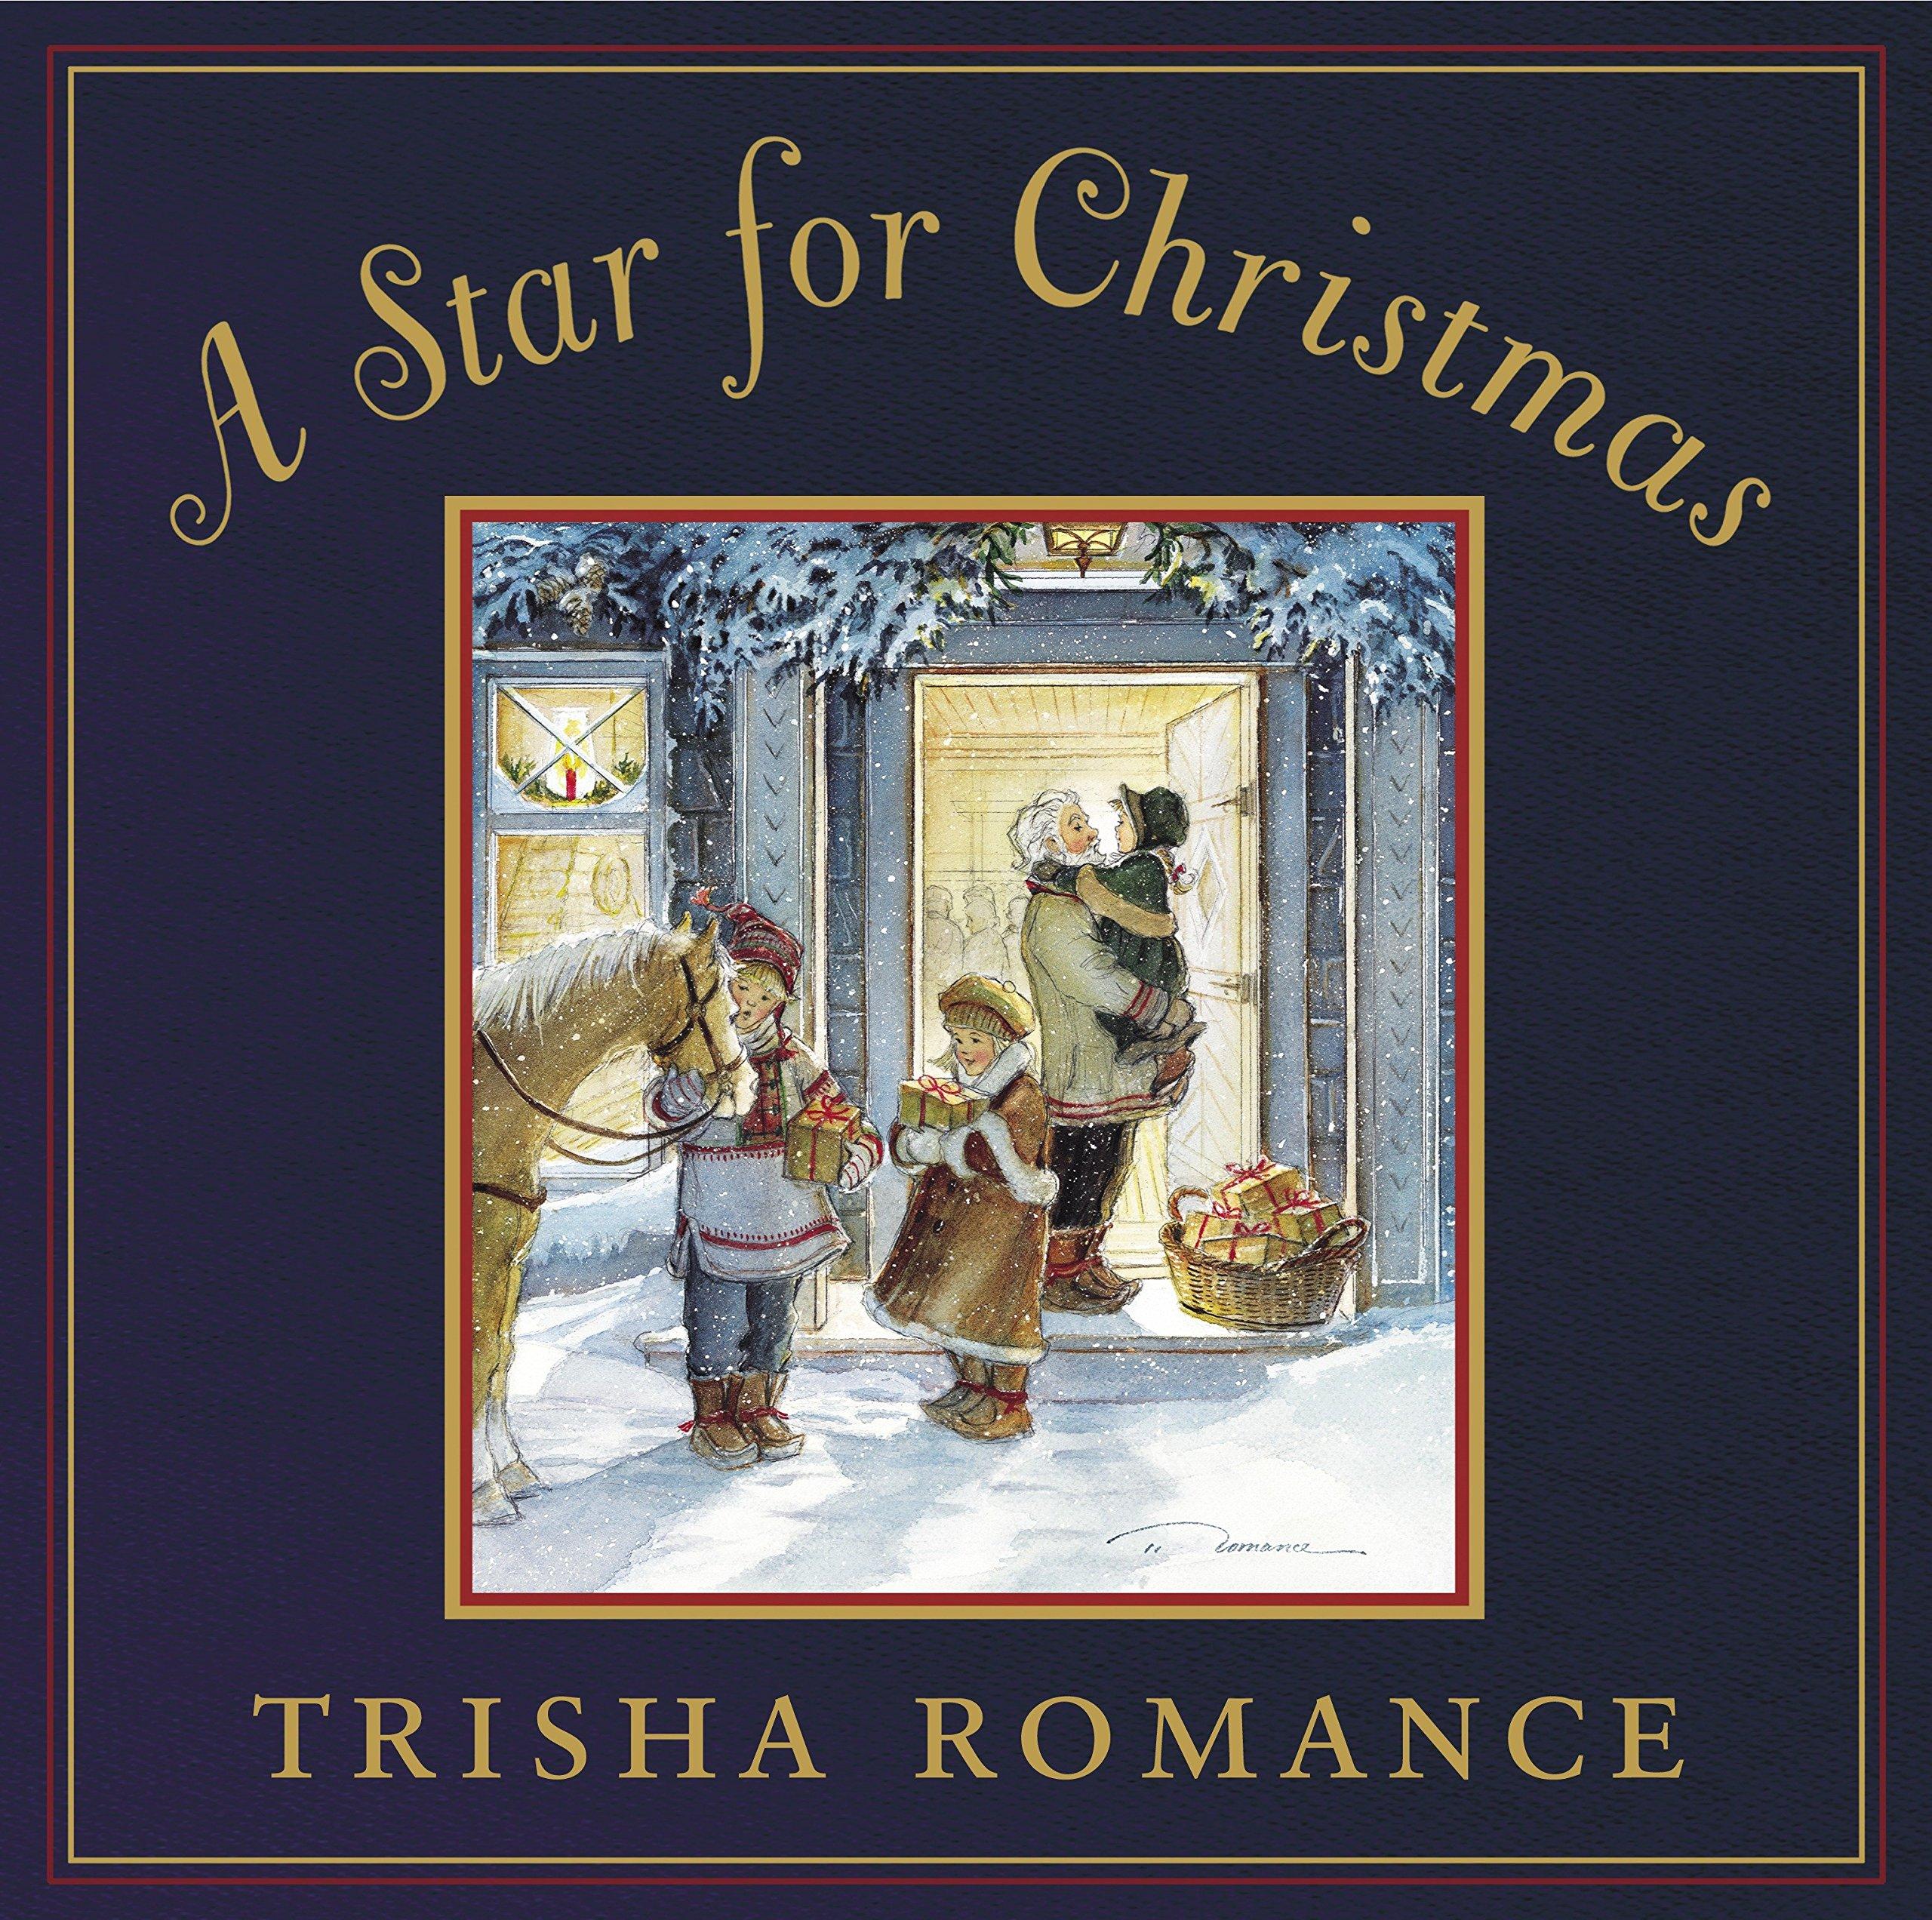 A Star For Christmas.A Star For Christmas Trisha Romance 9780887768361 Amazon